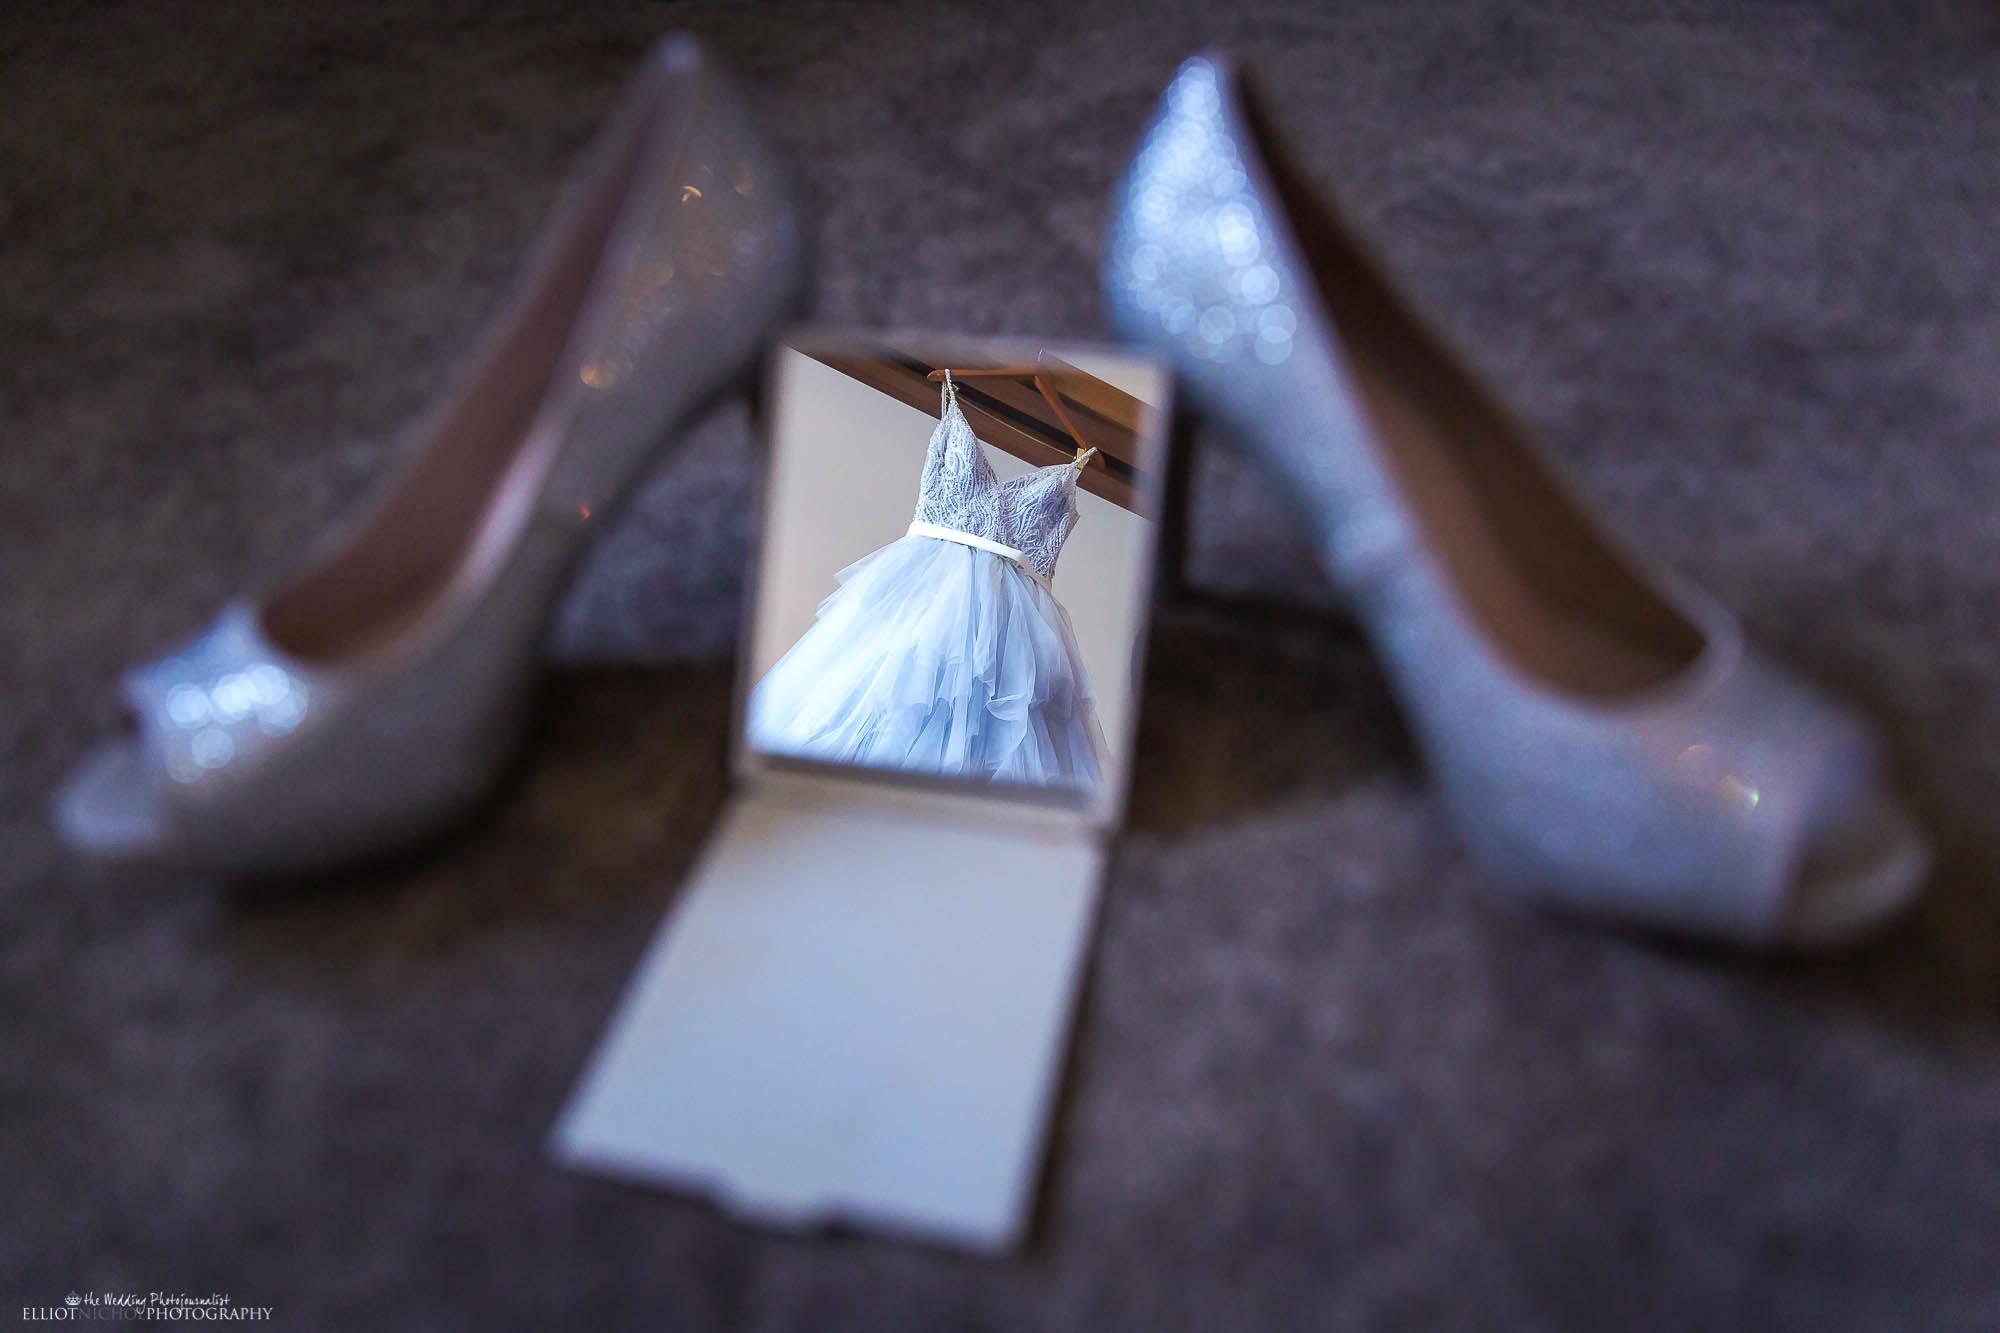 Brides blue wedding dress reflected in a hand mirror. Creative wedding photography by North East wedding photographer Elliot Nichol.